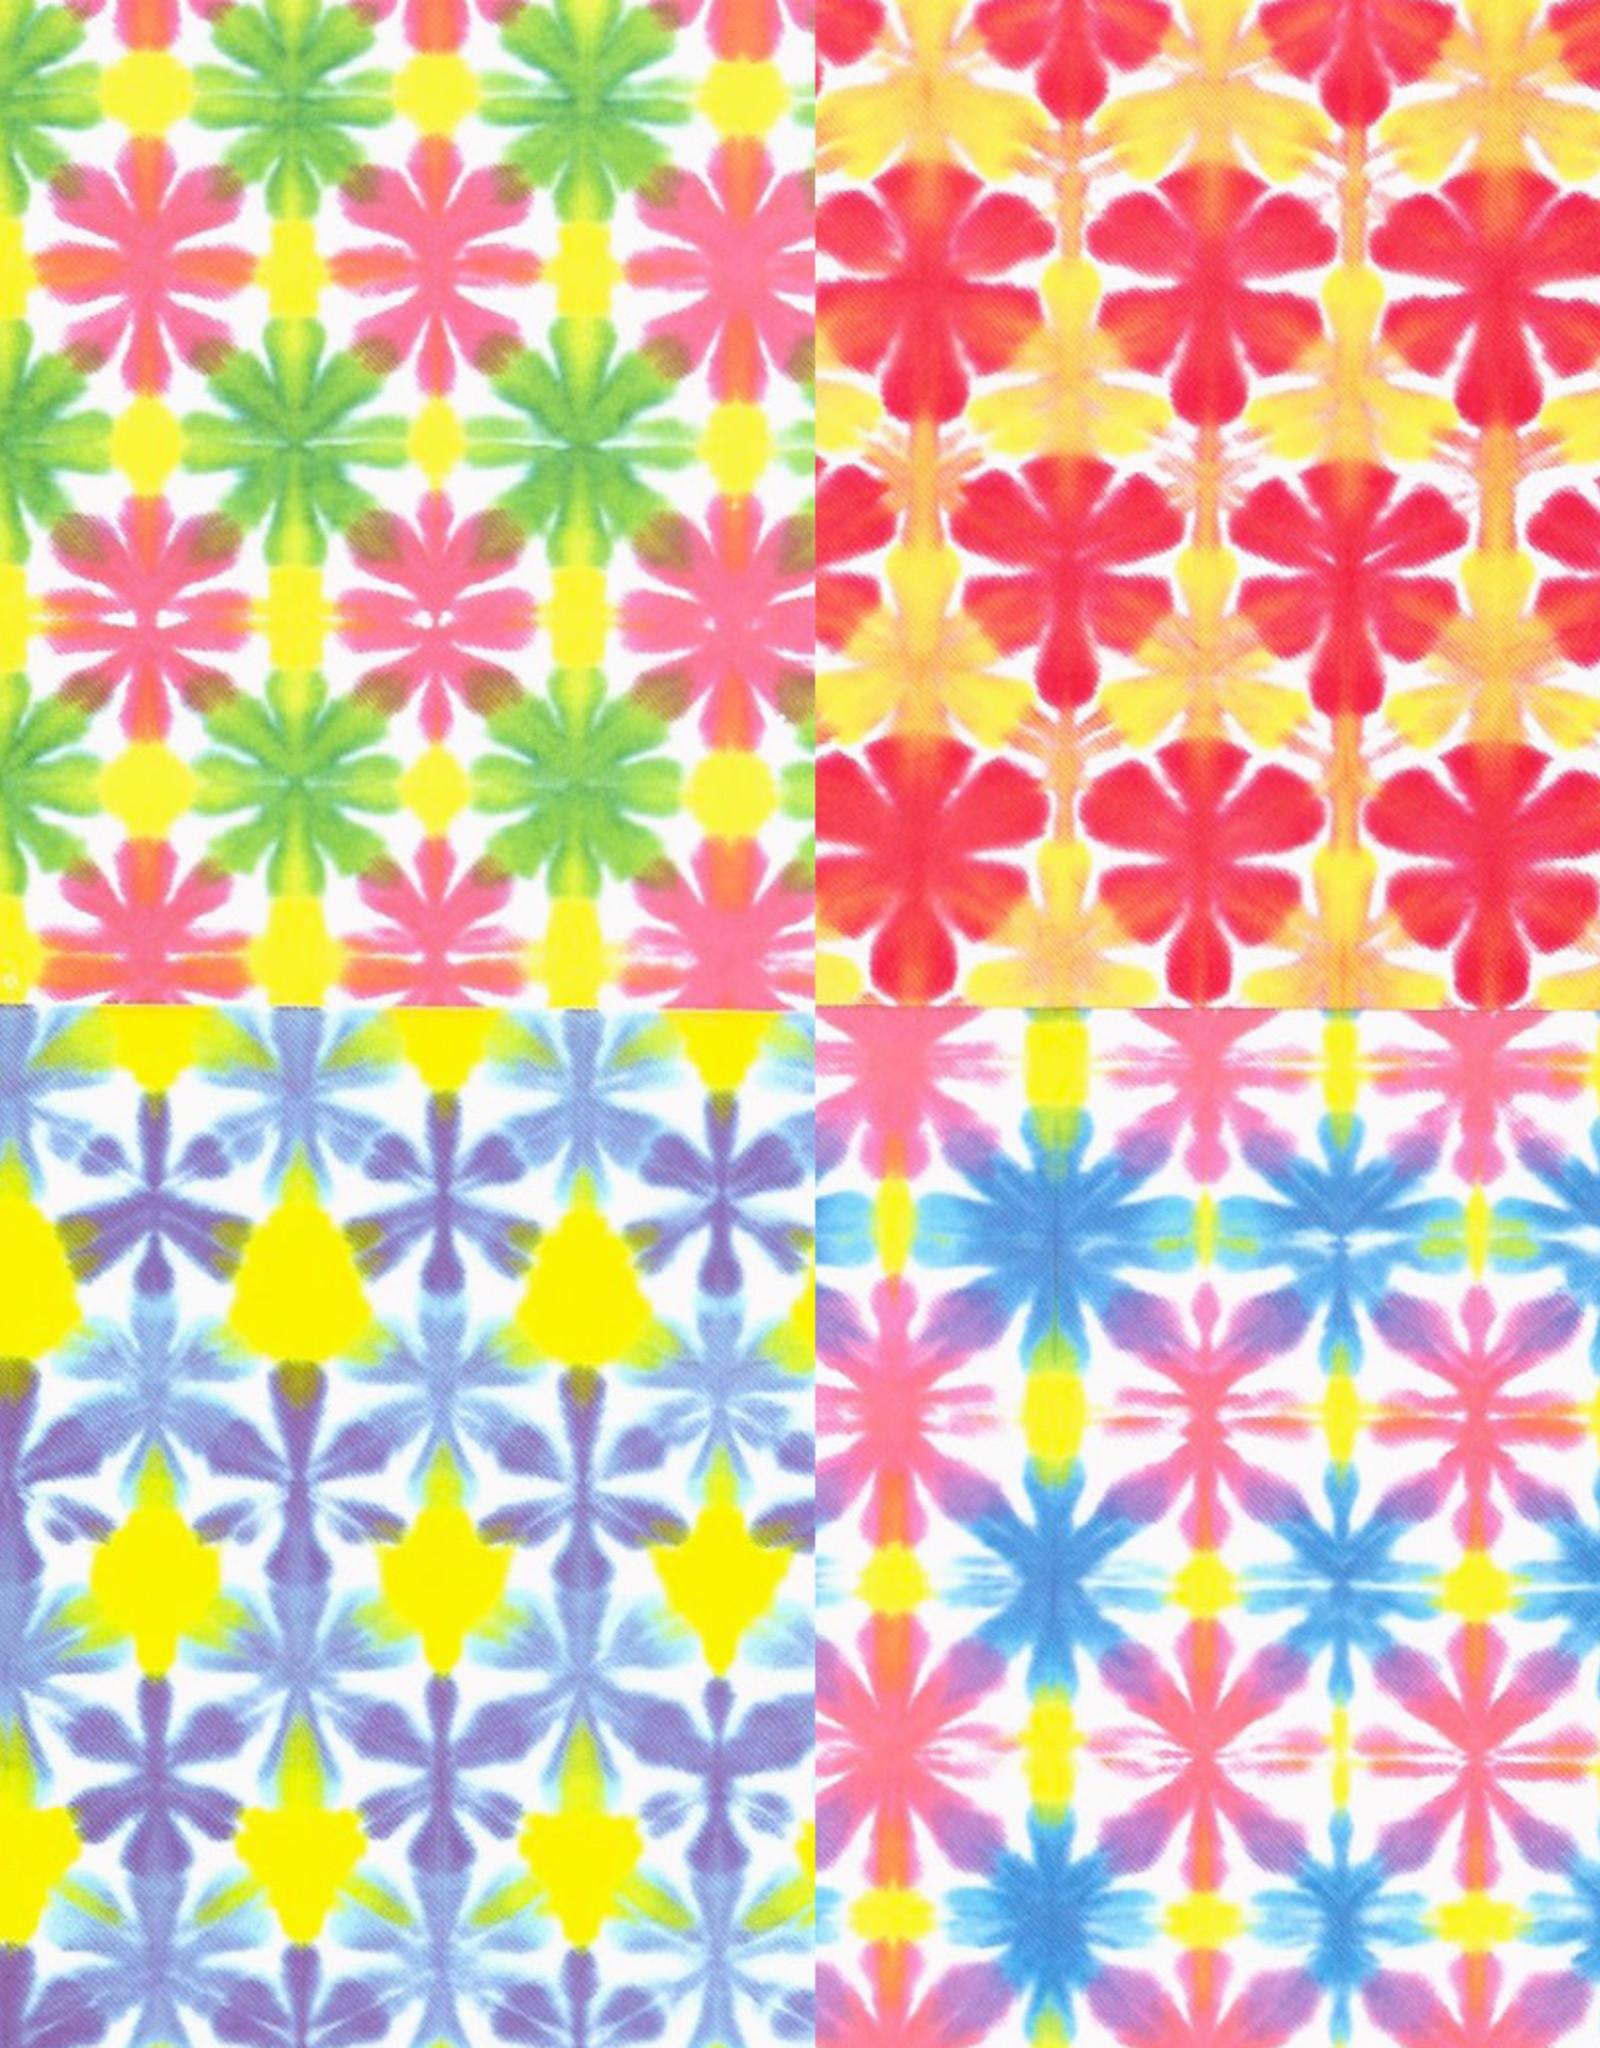 "Origami, 6"" x 6"", Hana Bokashi Chiyogami, 10 Sheets of 4 Different Colors, 40 Total Sheets"